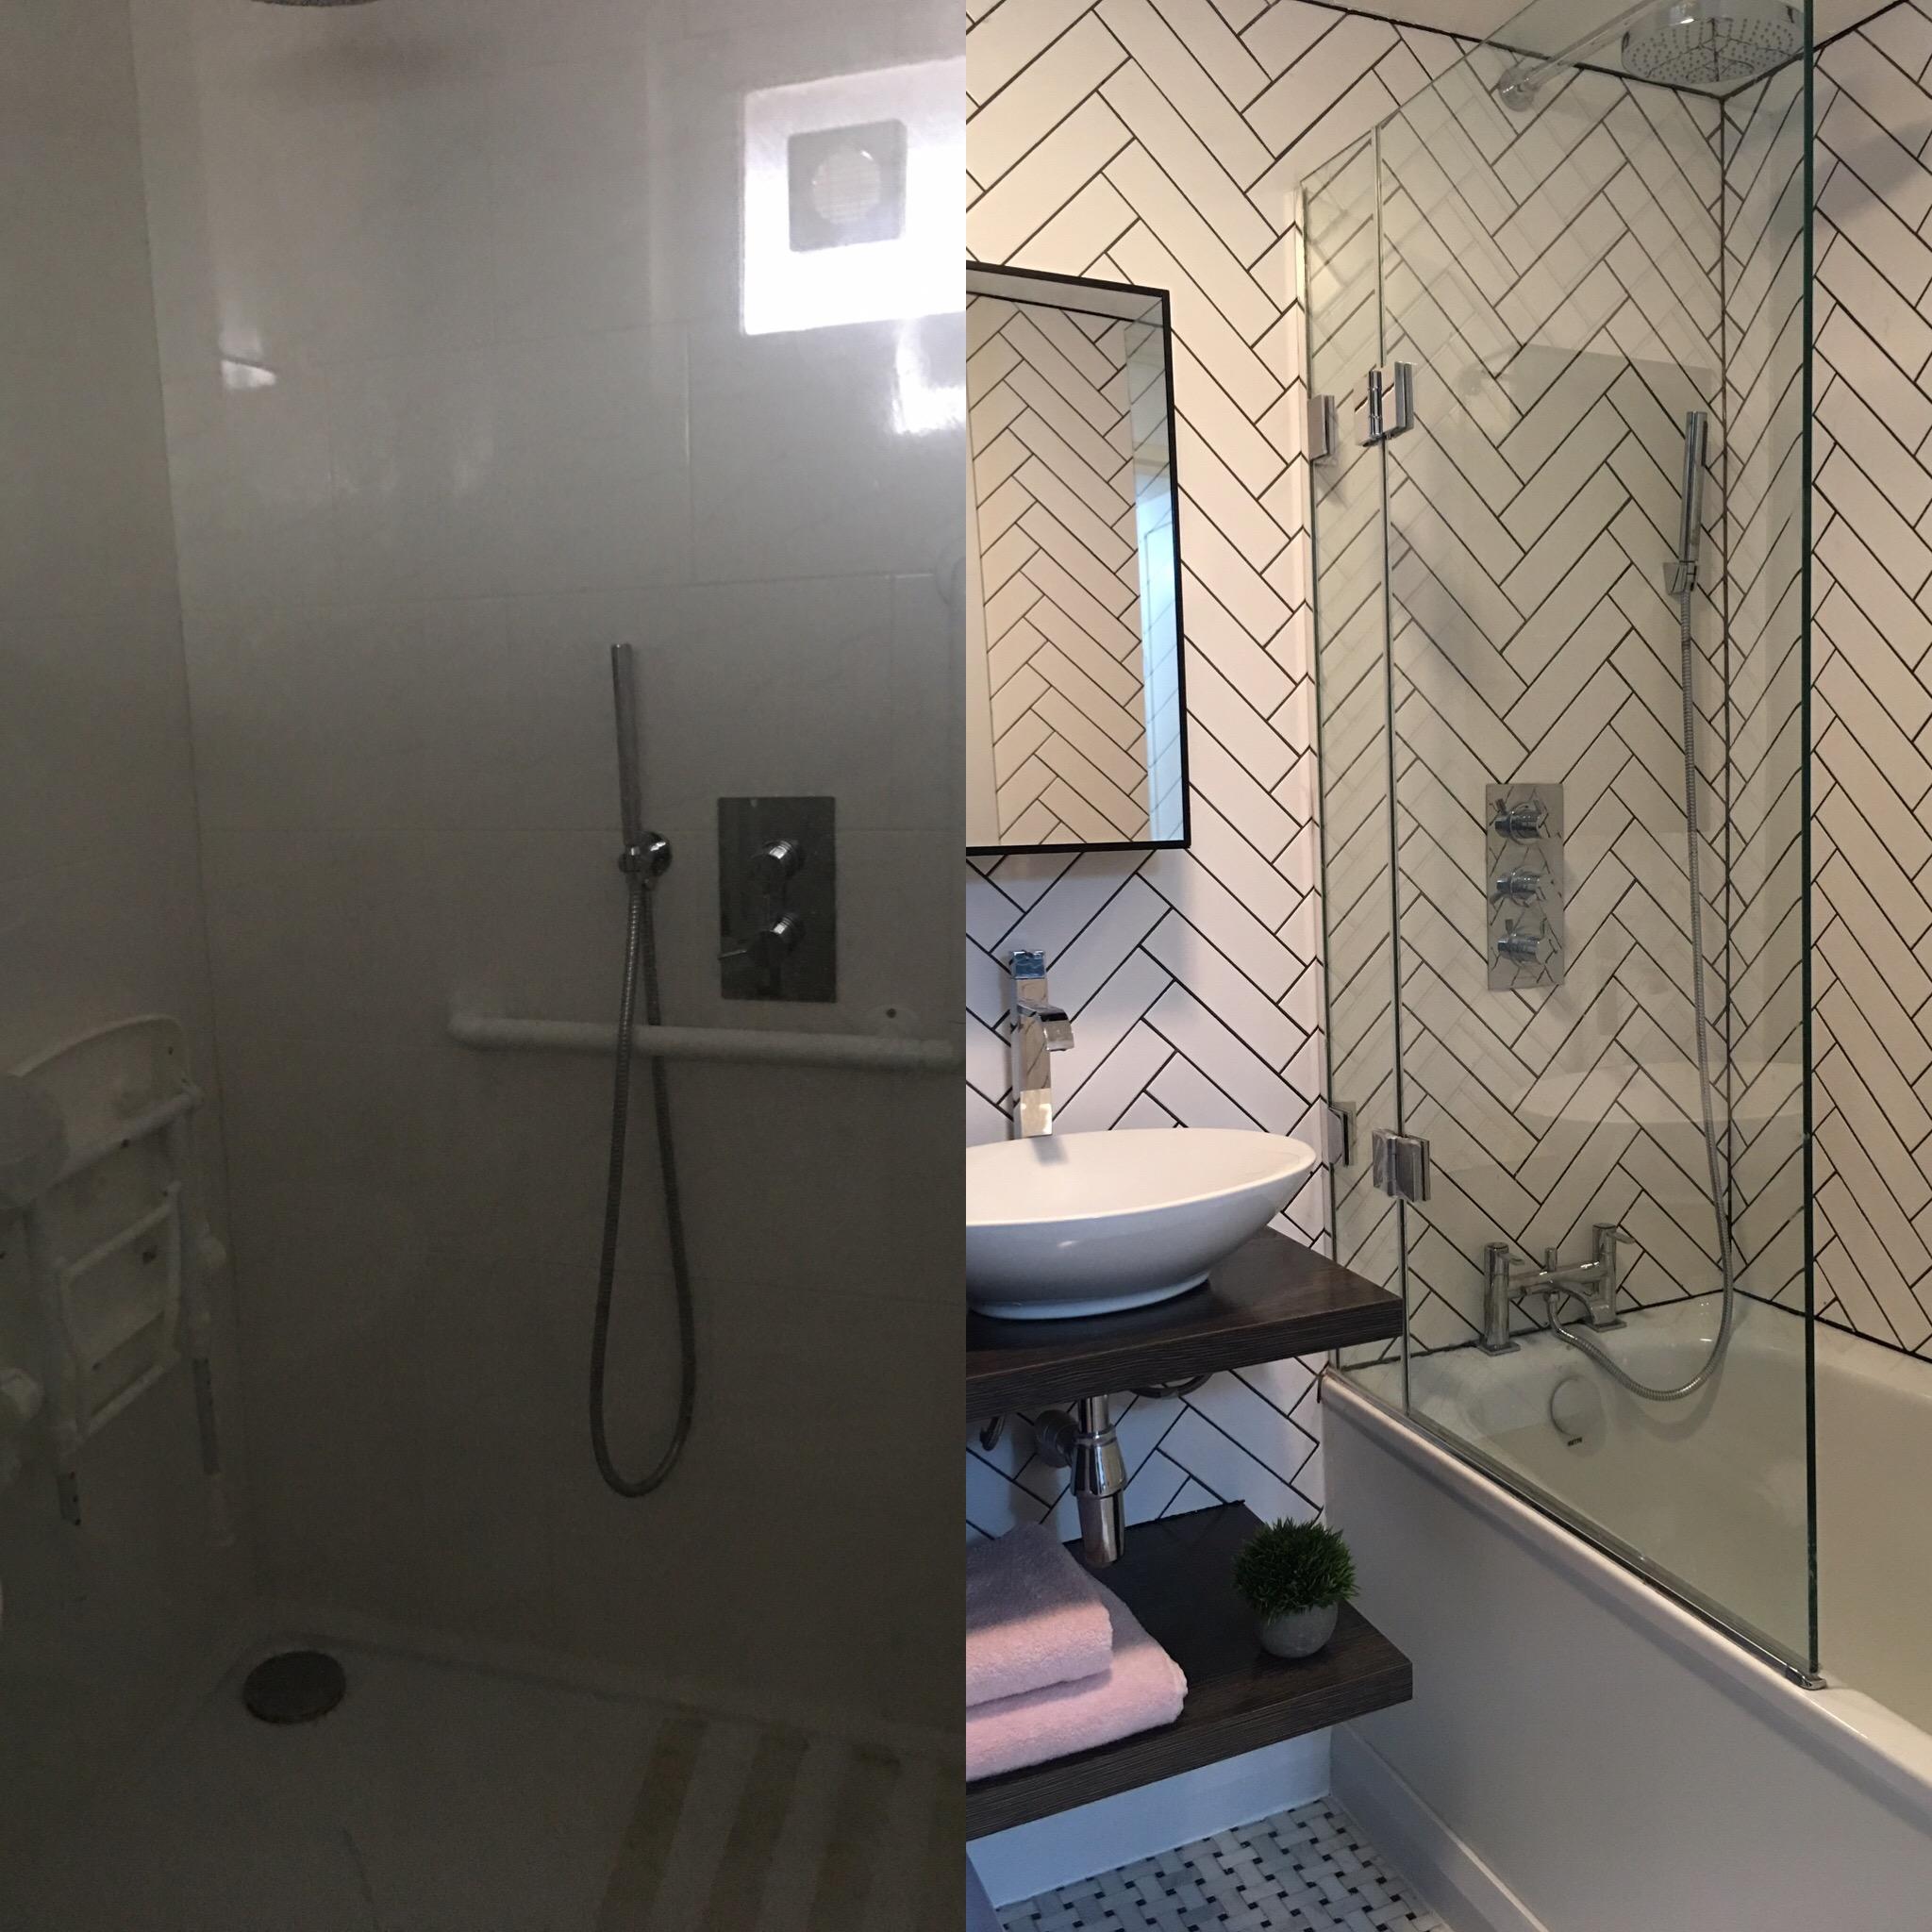 shower_before_after.jpg